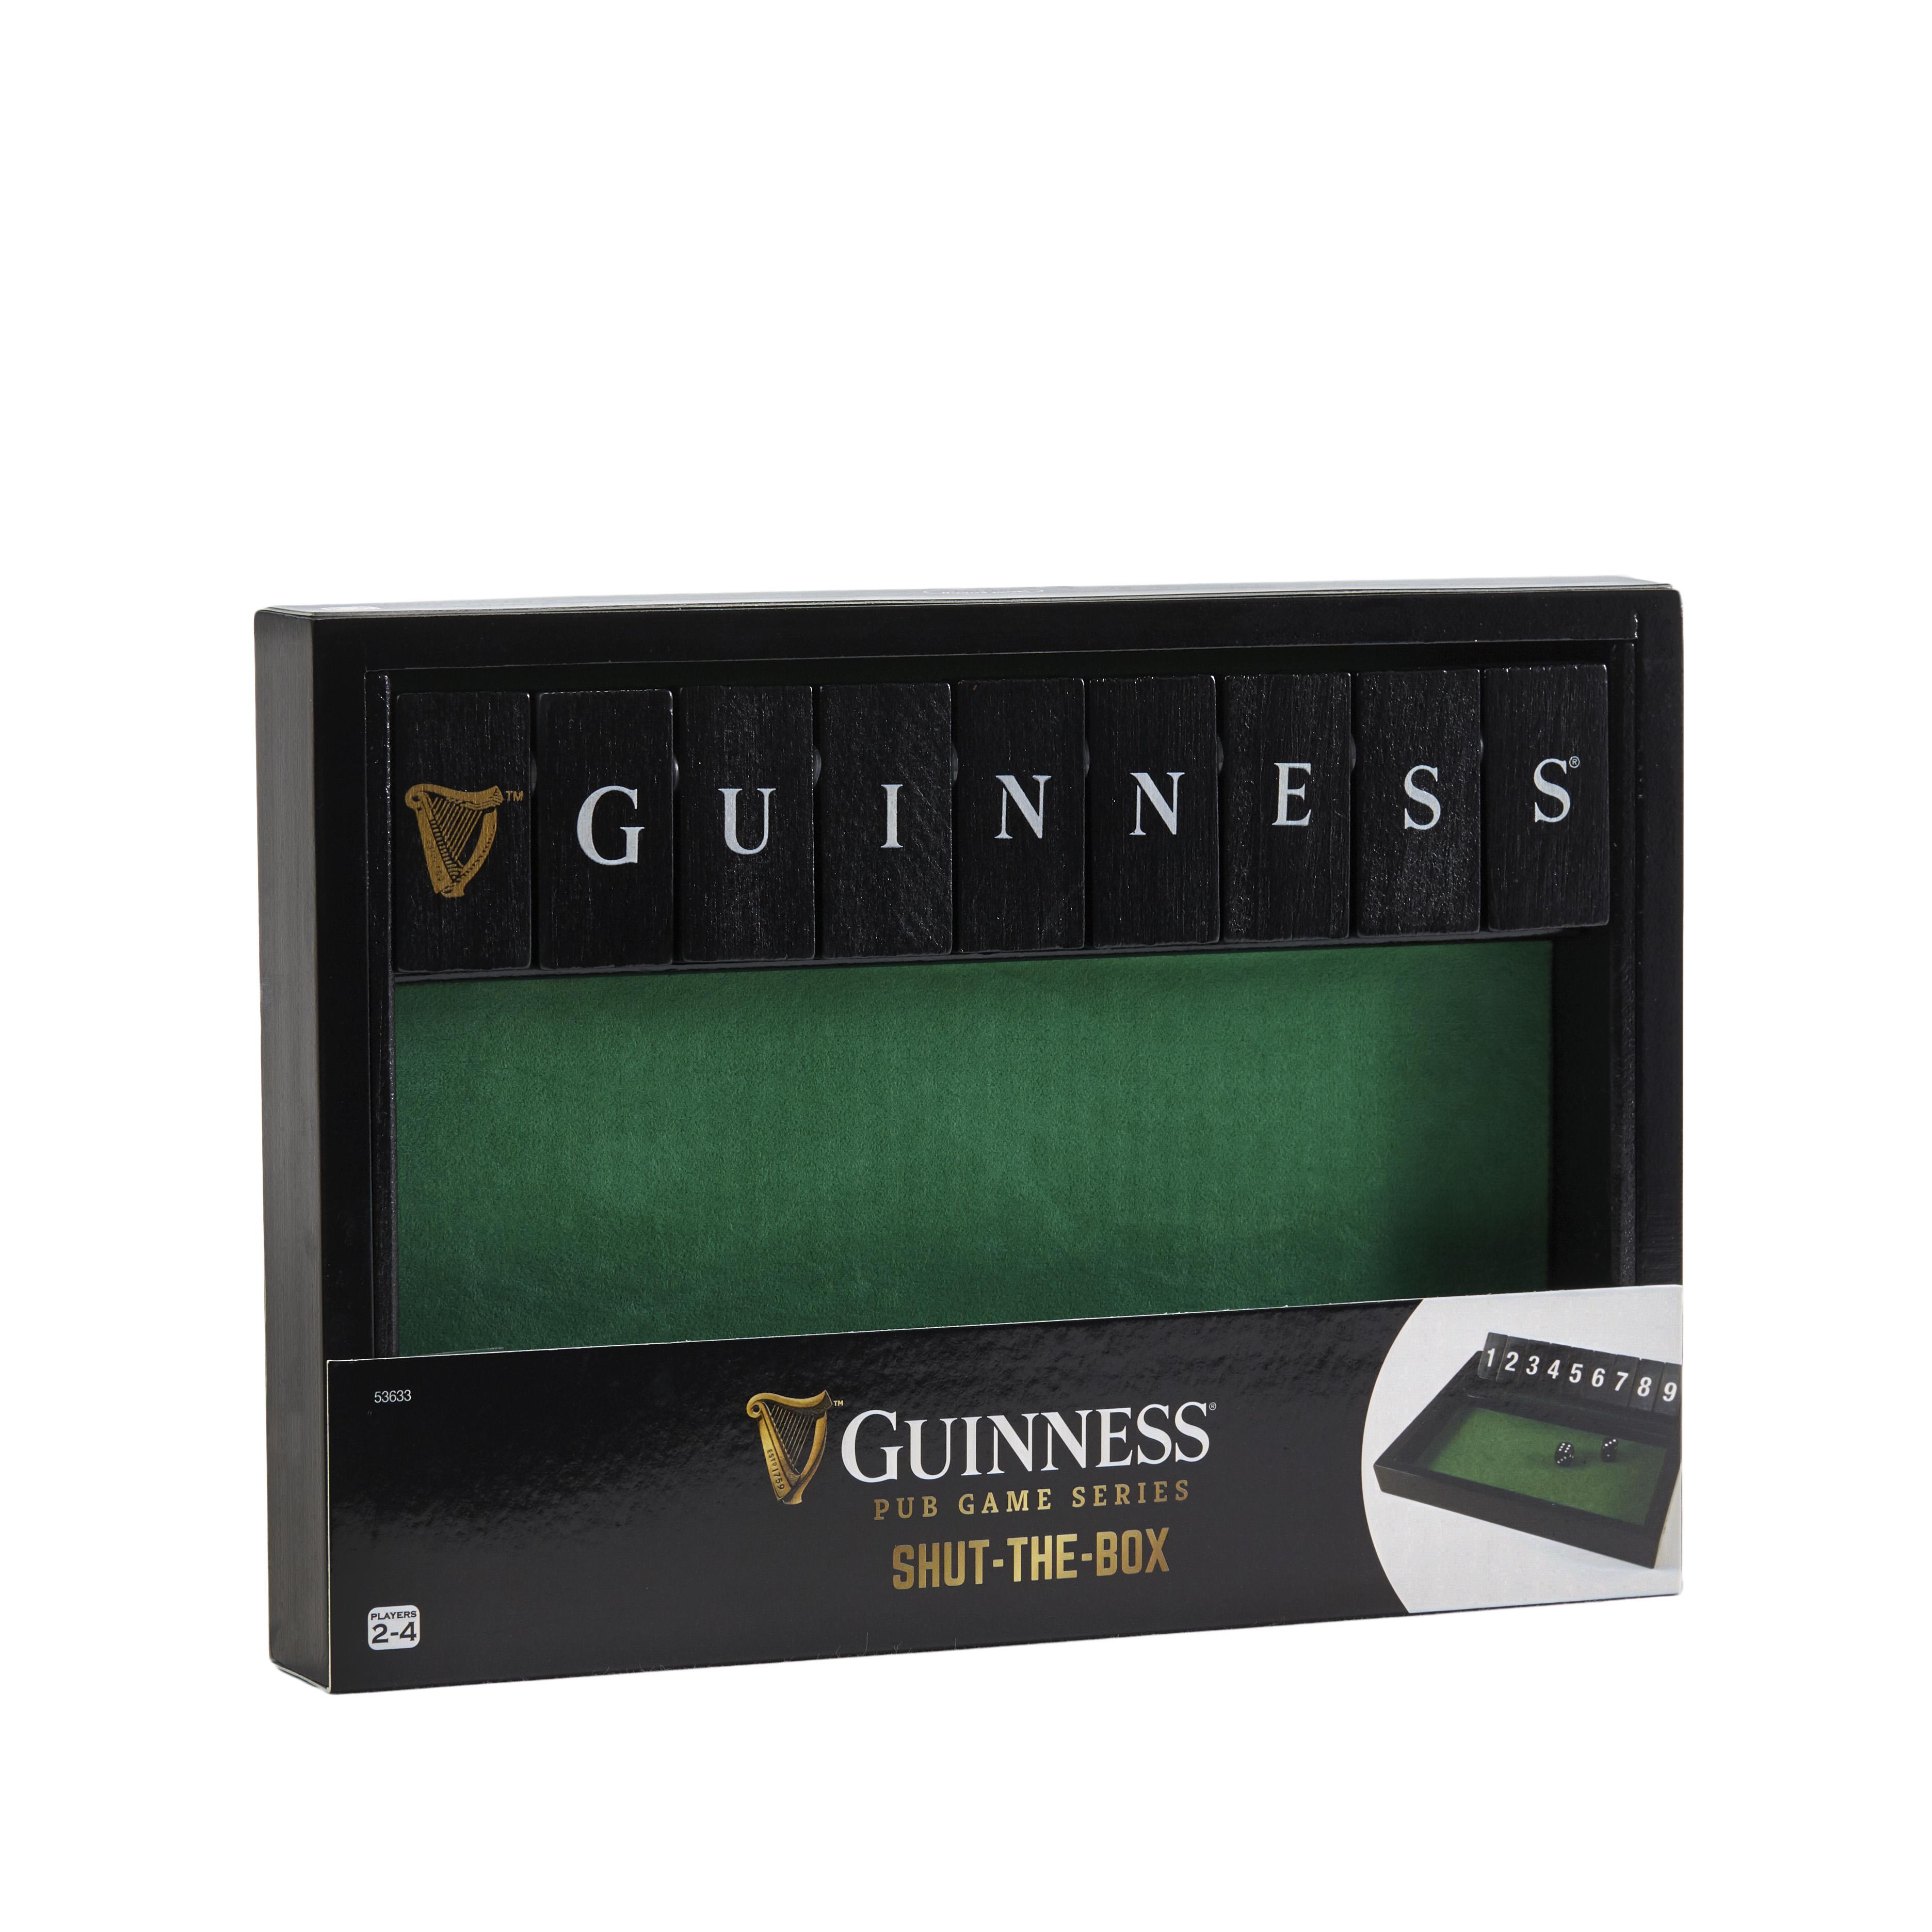 Guinness Games: Shut-the-Box